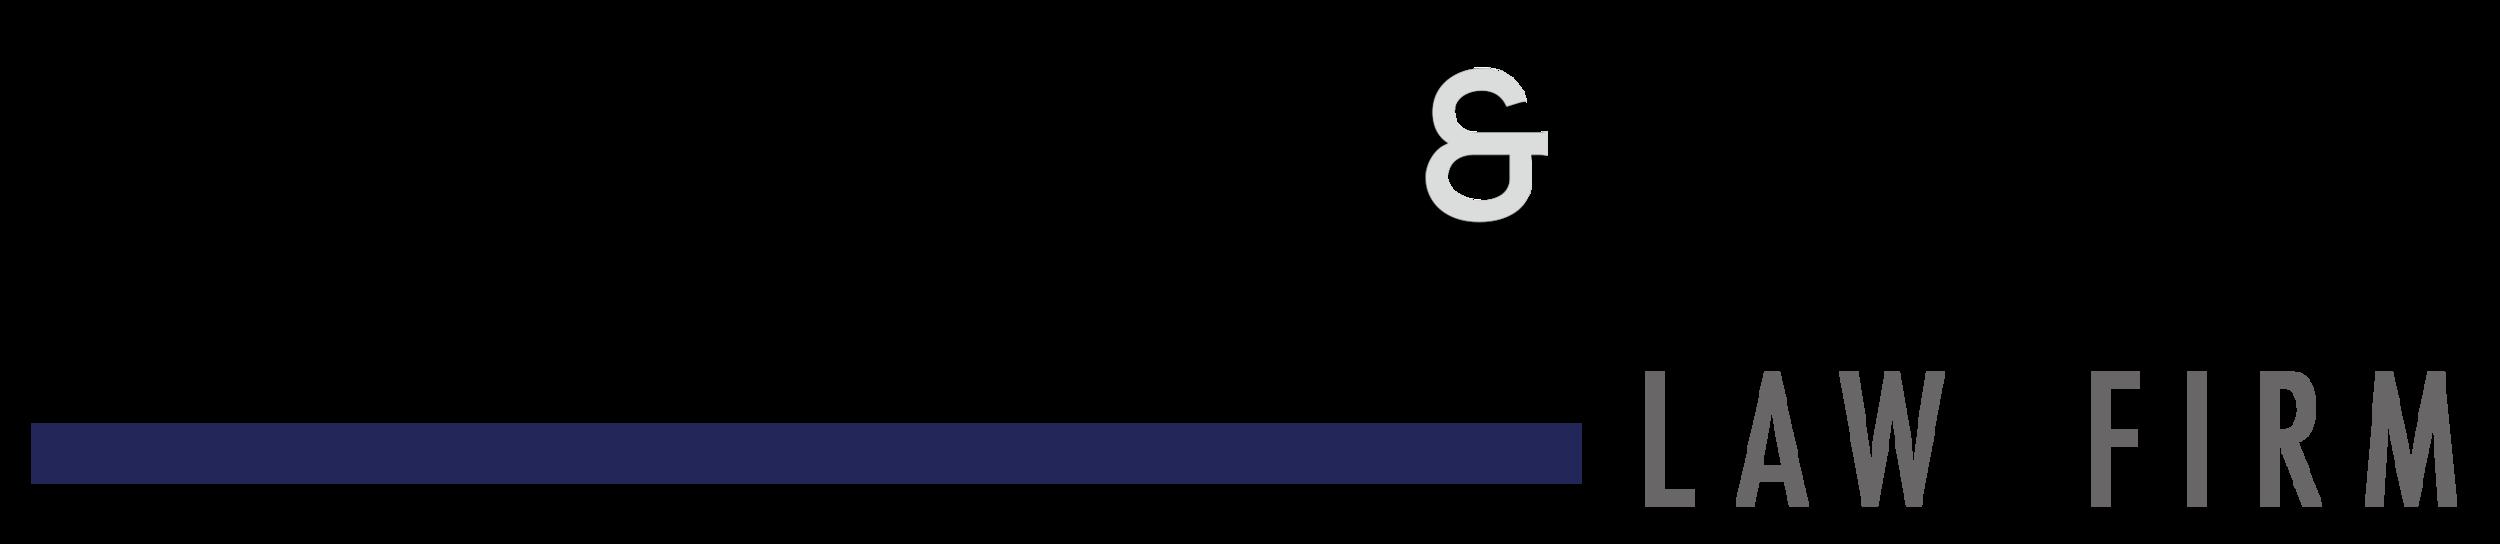 schmiege-graff-logo-2.png